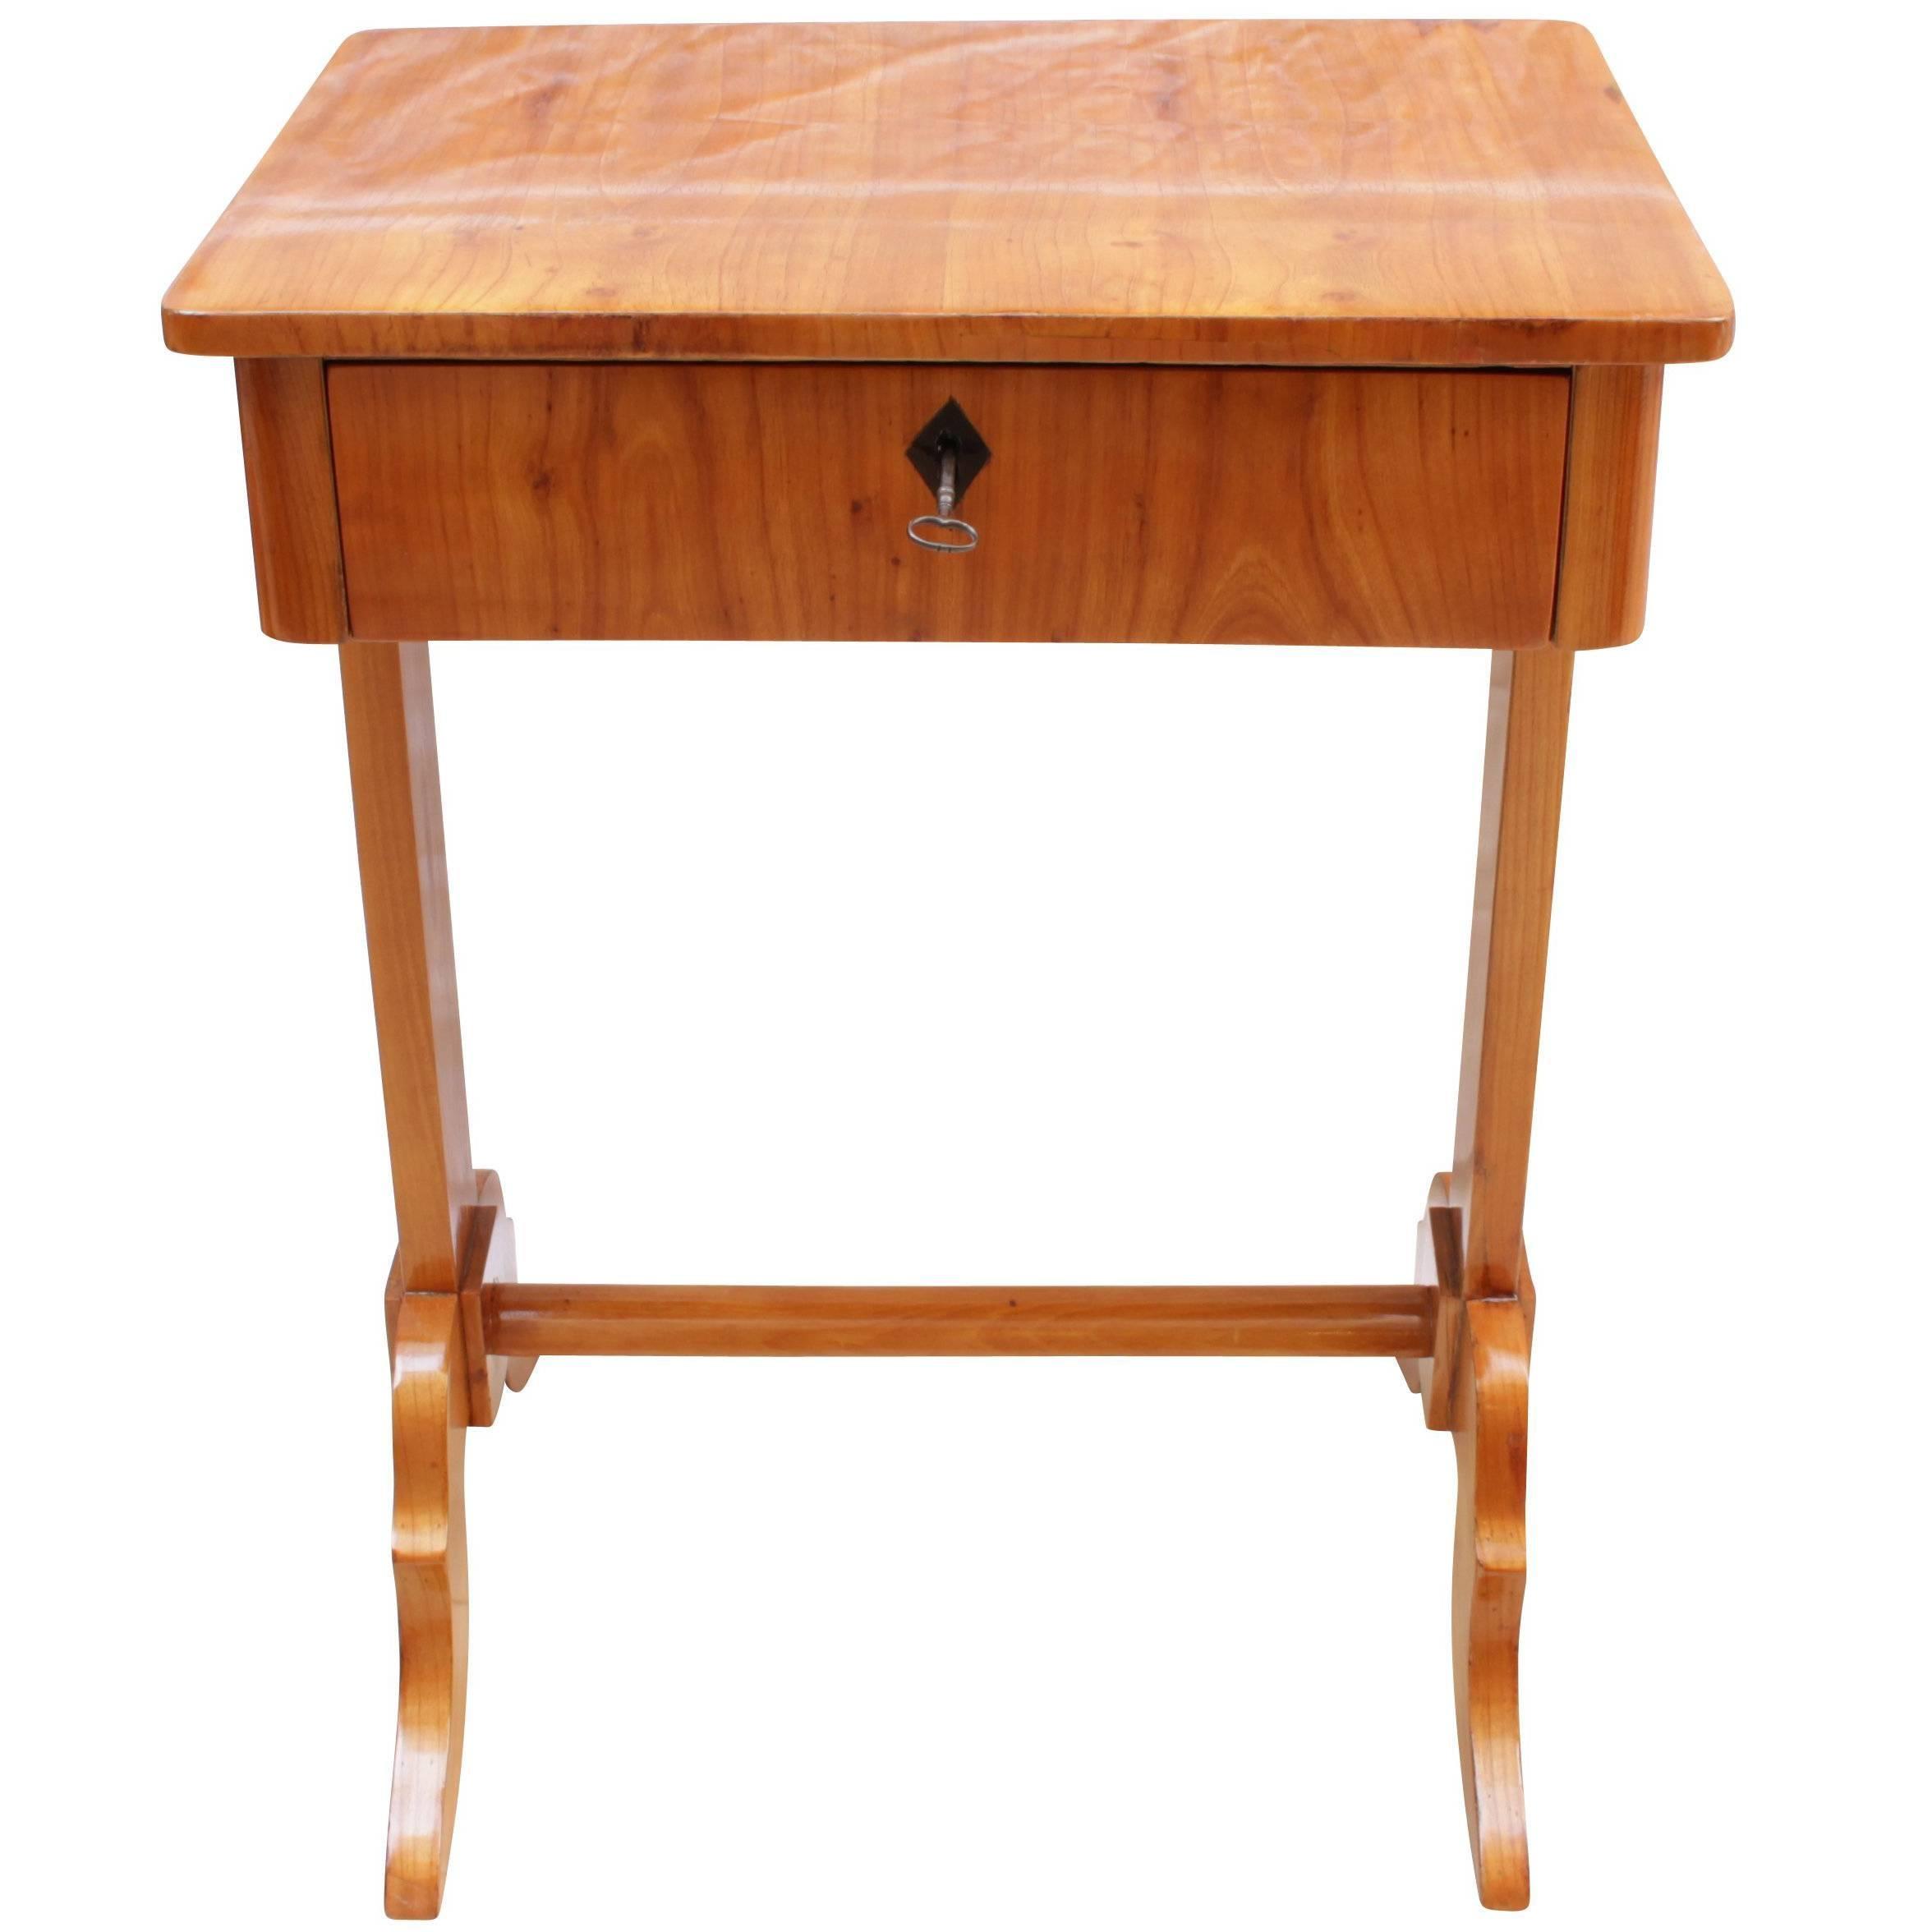 Good 19th Century Biedermeier Sewing Or Side Table Made Of Cherrywood